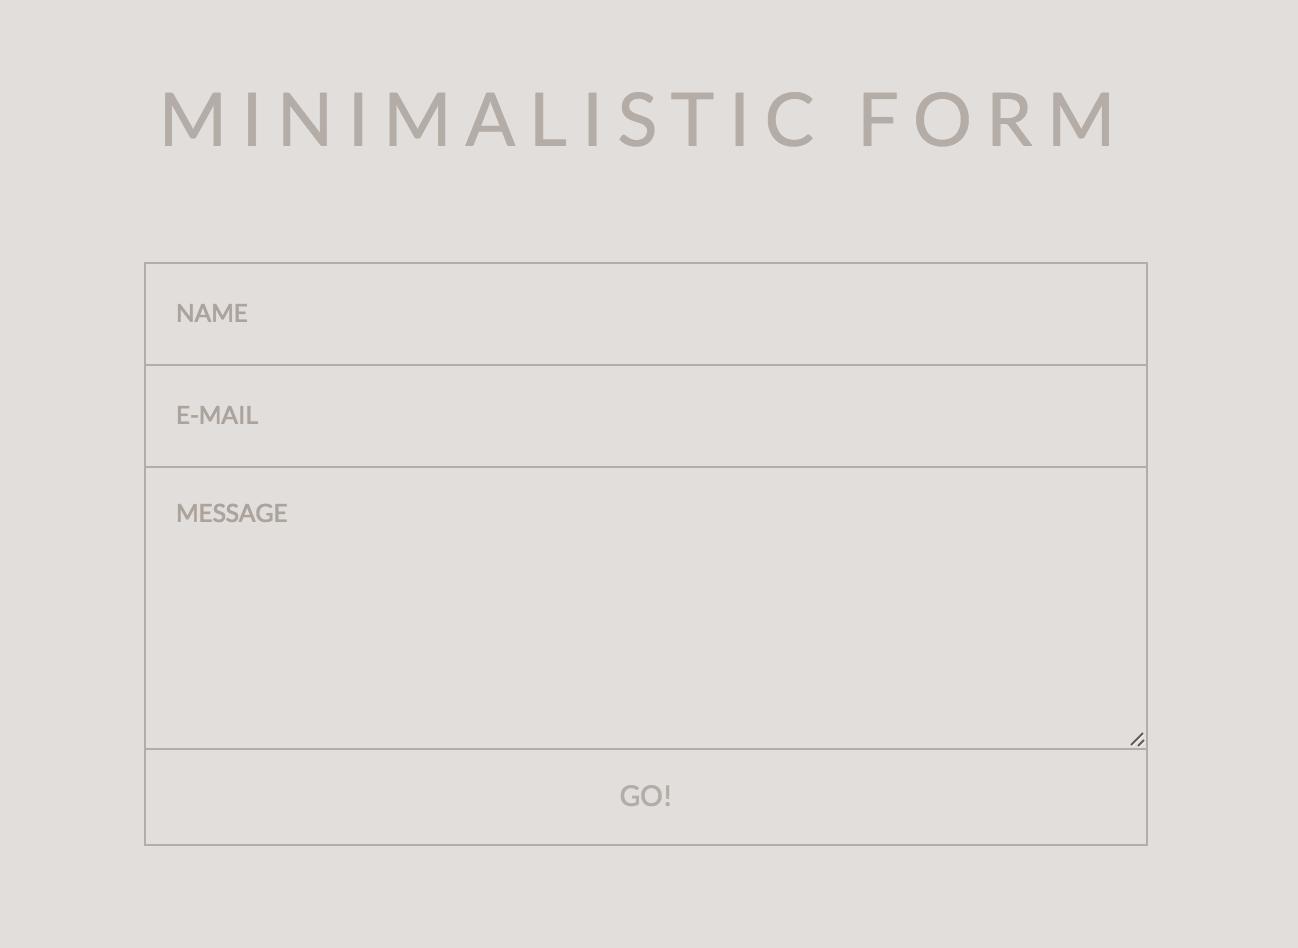 MINIMALISTIC FORM